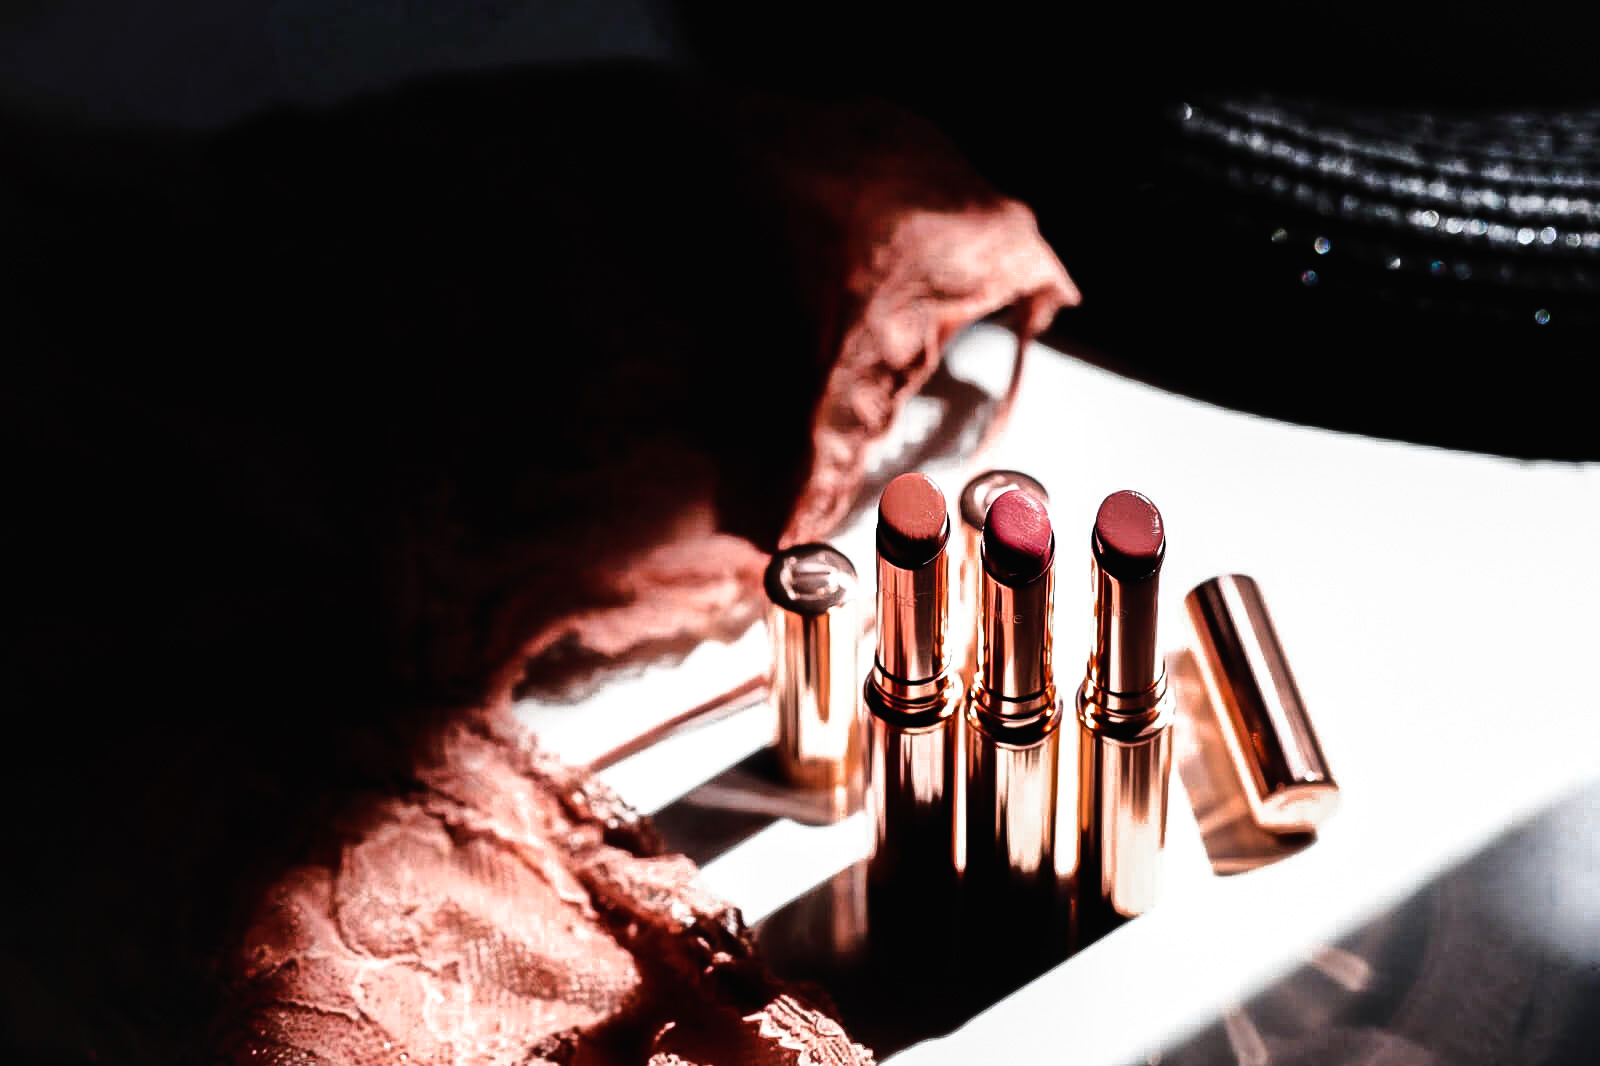 Charlotte Tilbury Superstar Lips rouge a lèvres gloss revue